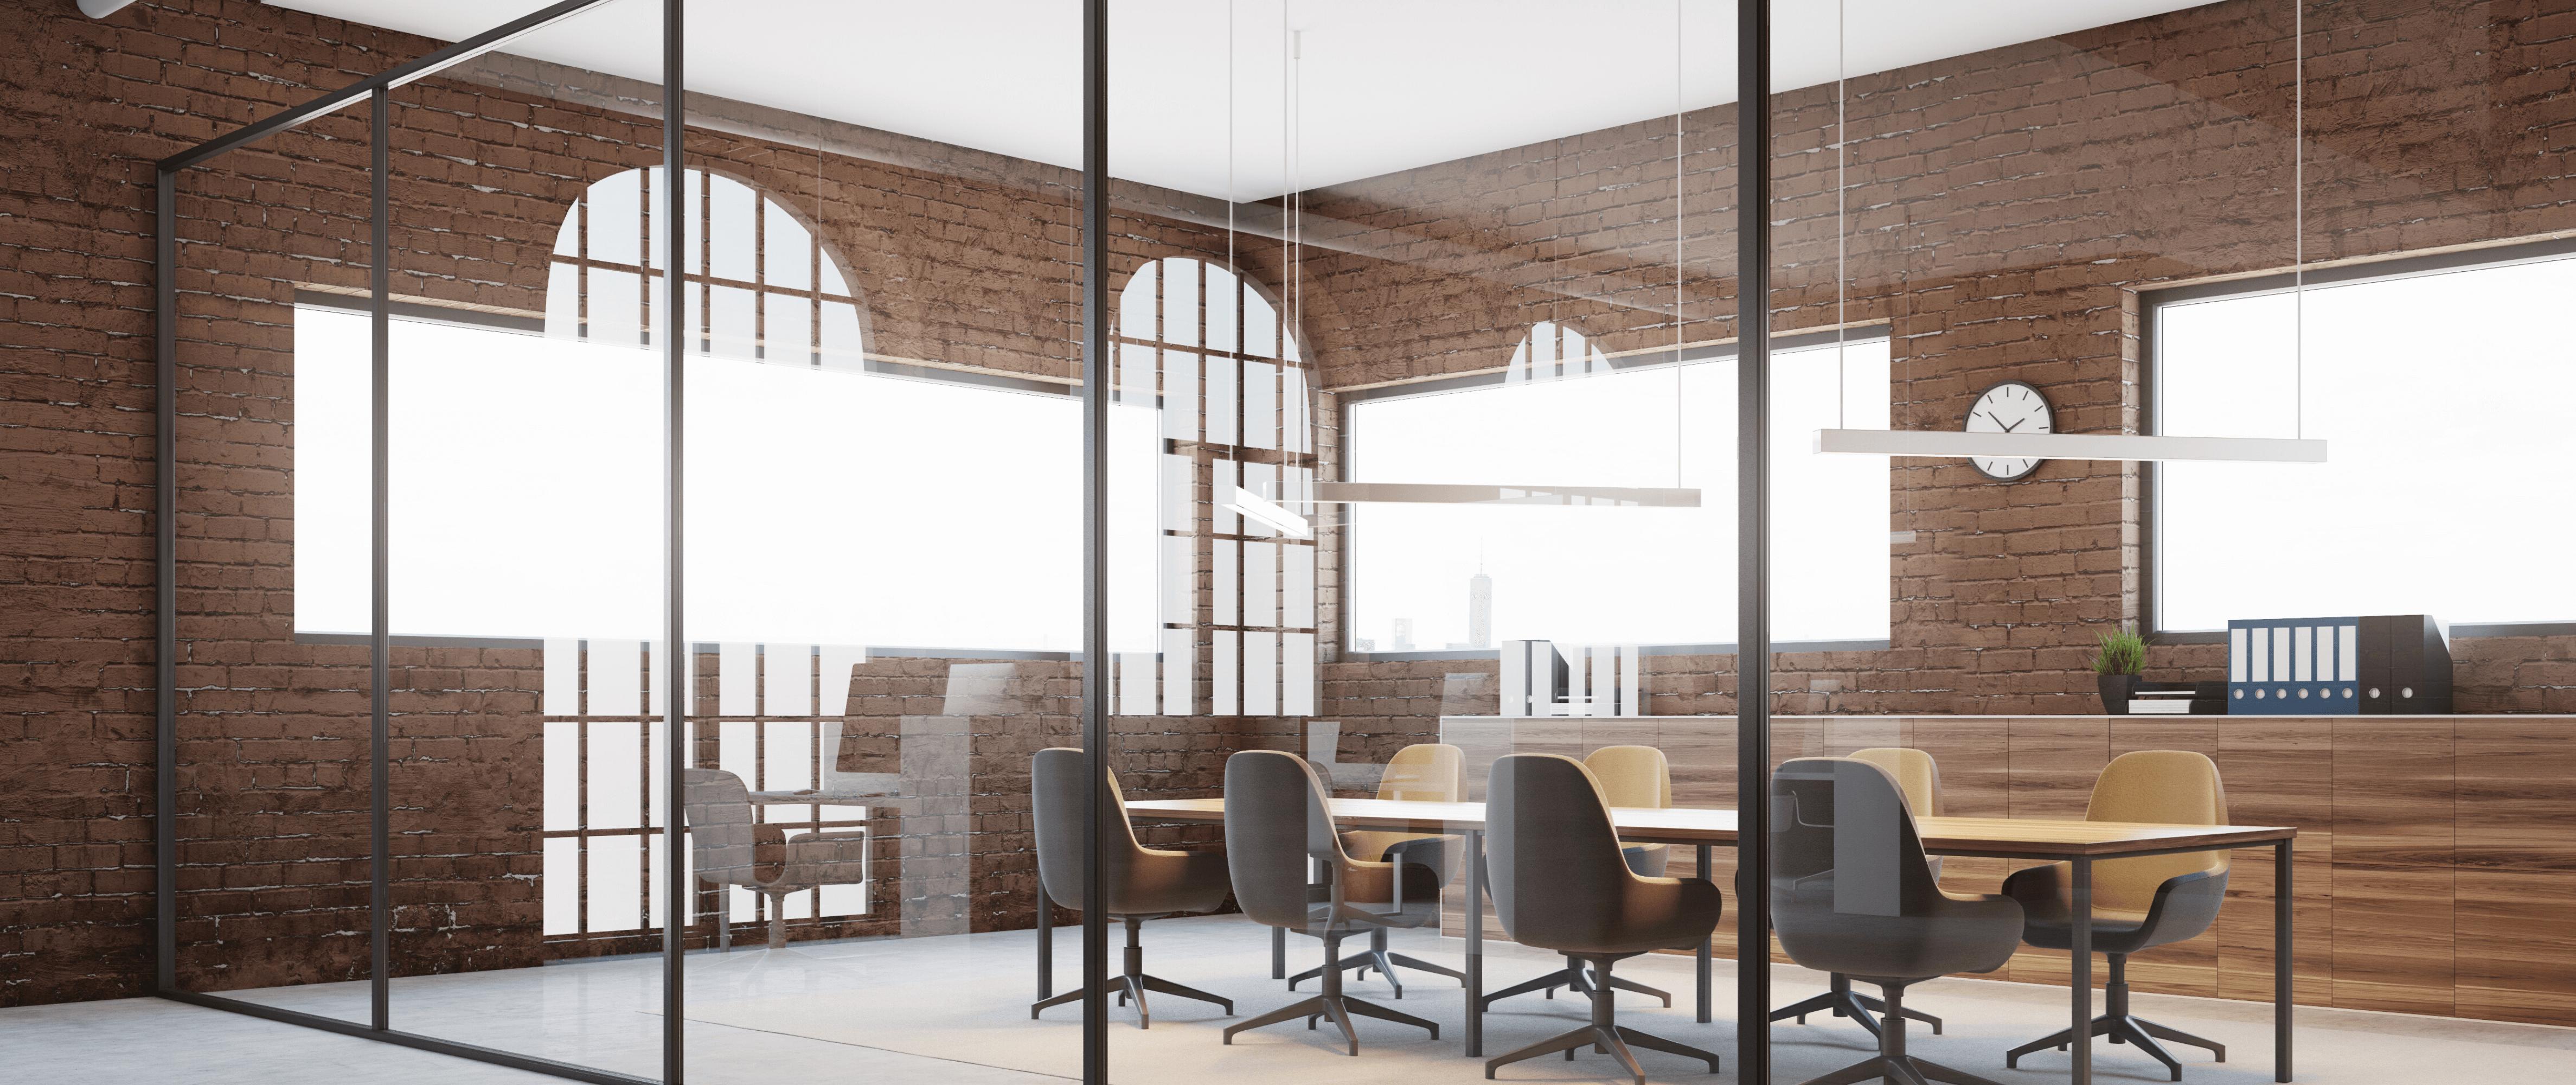 "Dan Boram speaks on ""Post-COVID Office Design"""